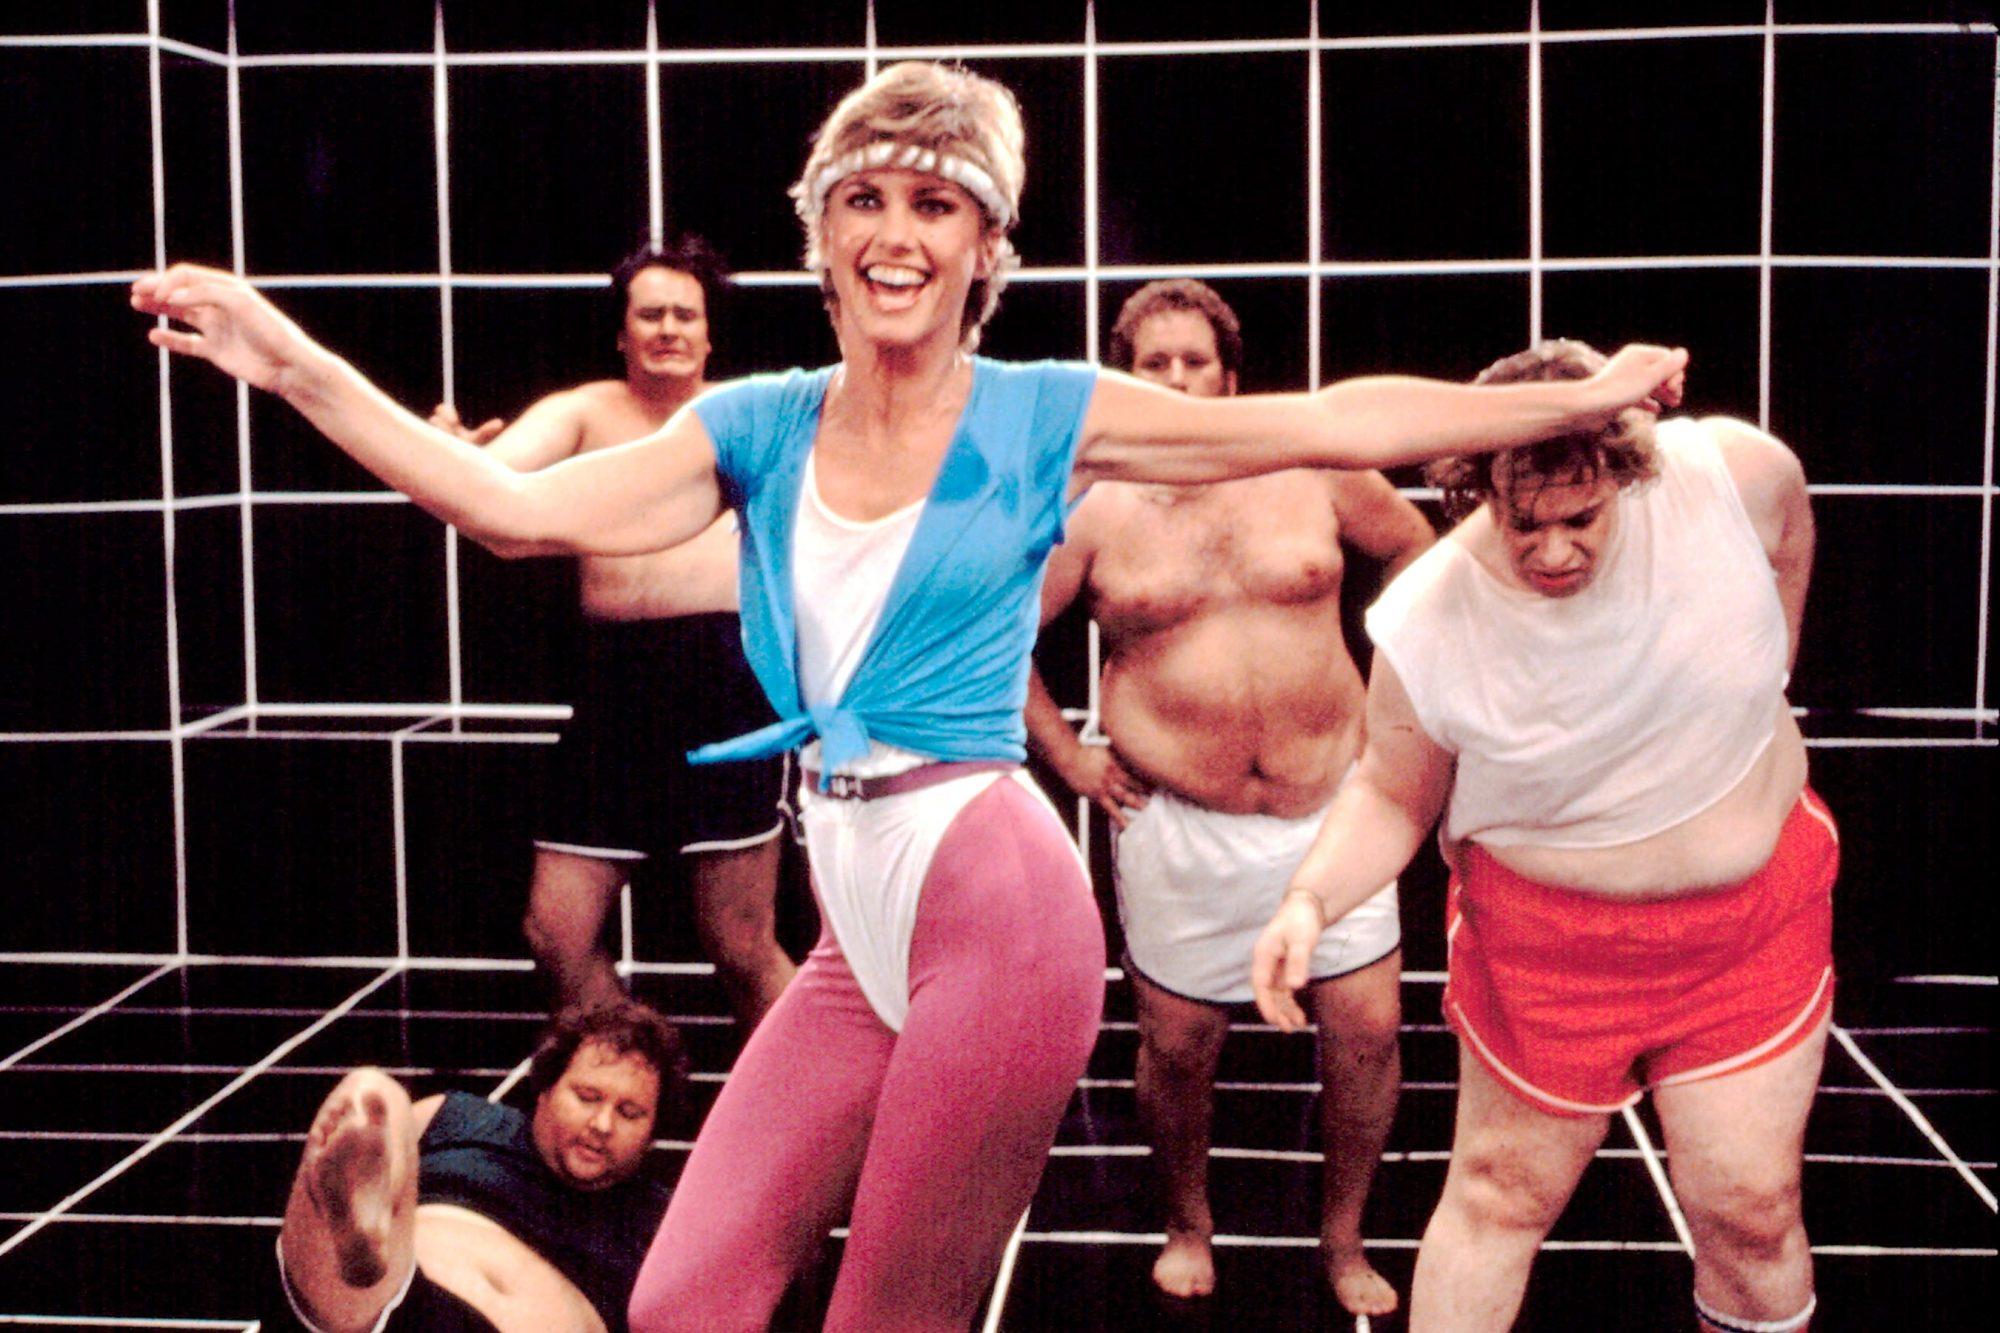 OLIVIA NEWTON-JOHN, Physical video, circa 1981-82